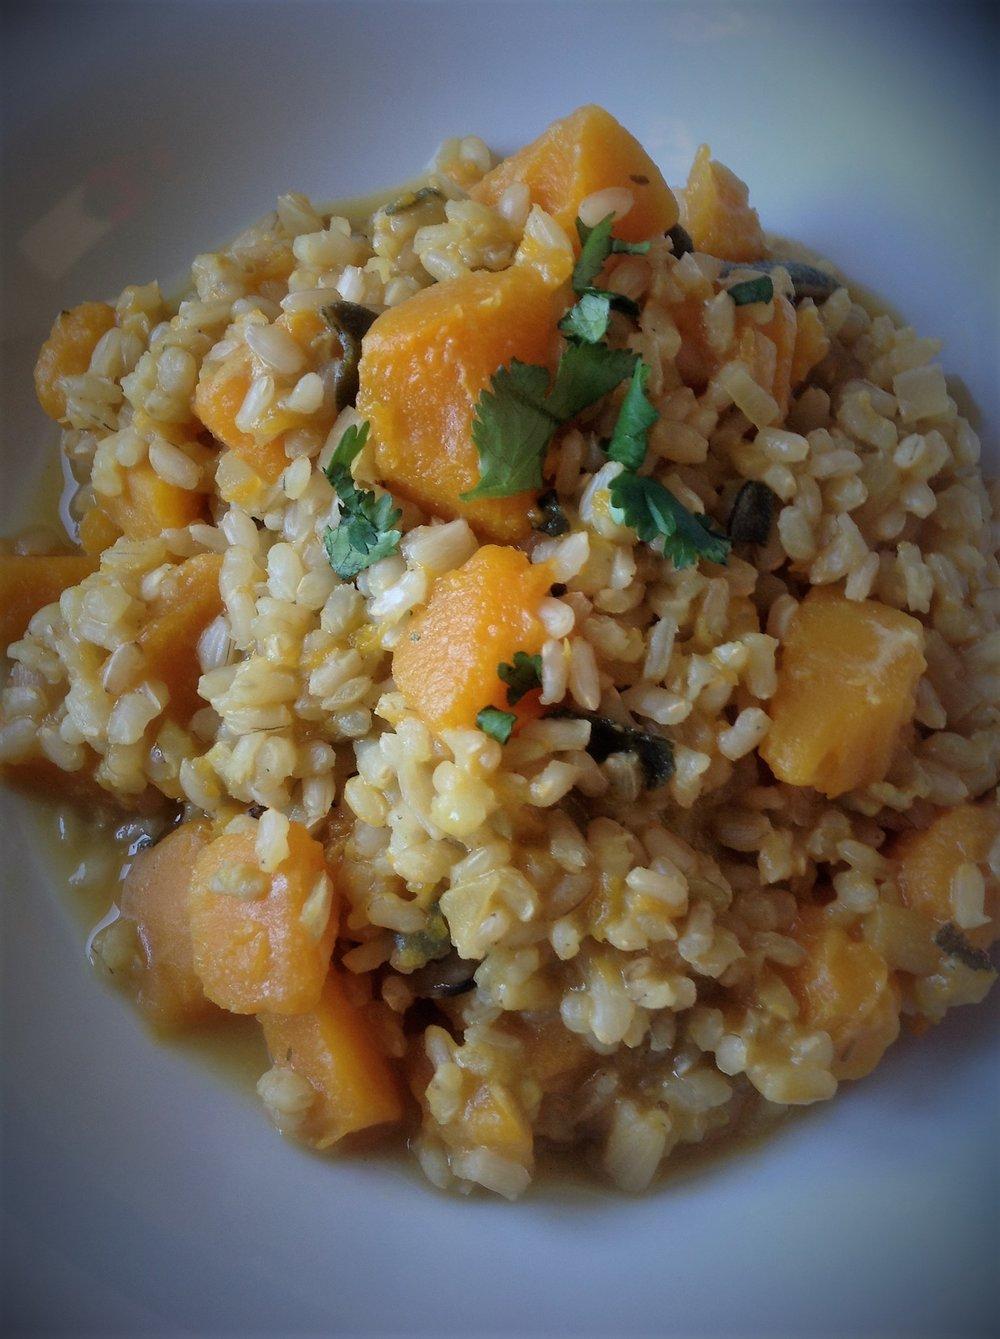 Butternut Squash Brown Rice Risotto - Vegan, Gluten-free, Healthy Italian classic